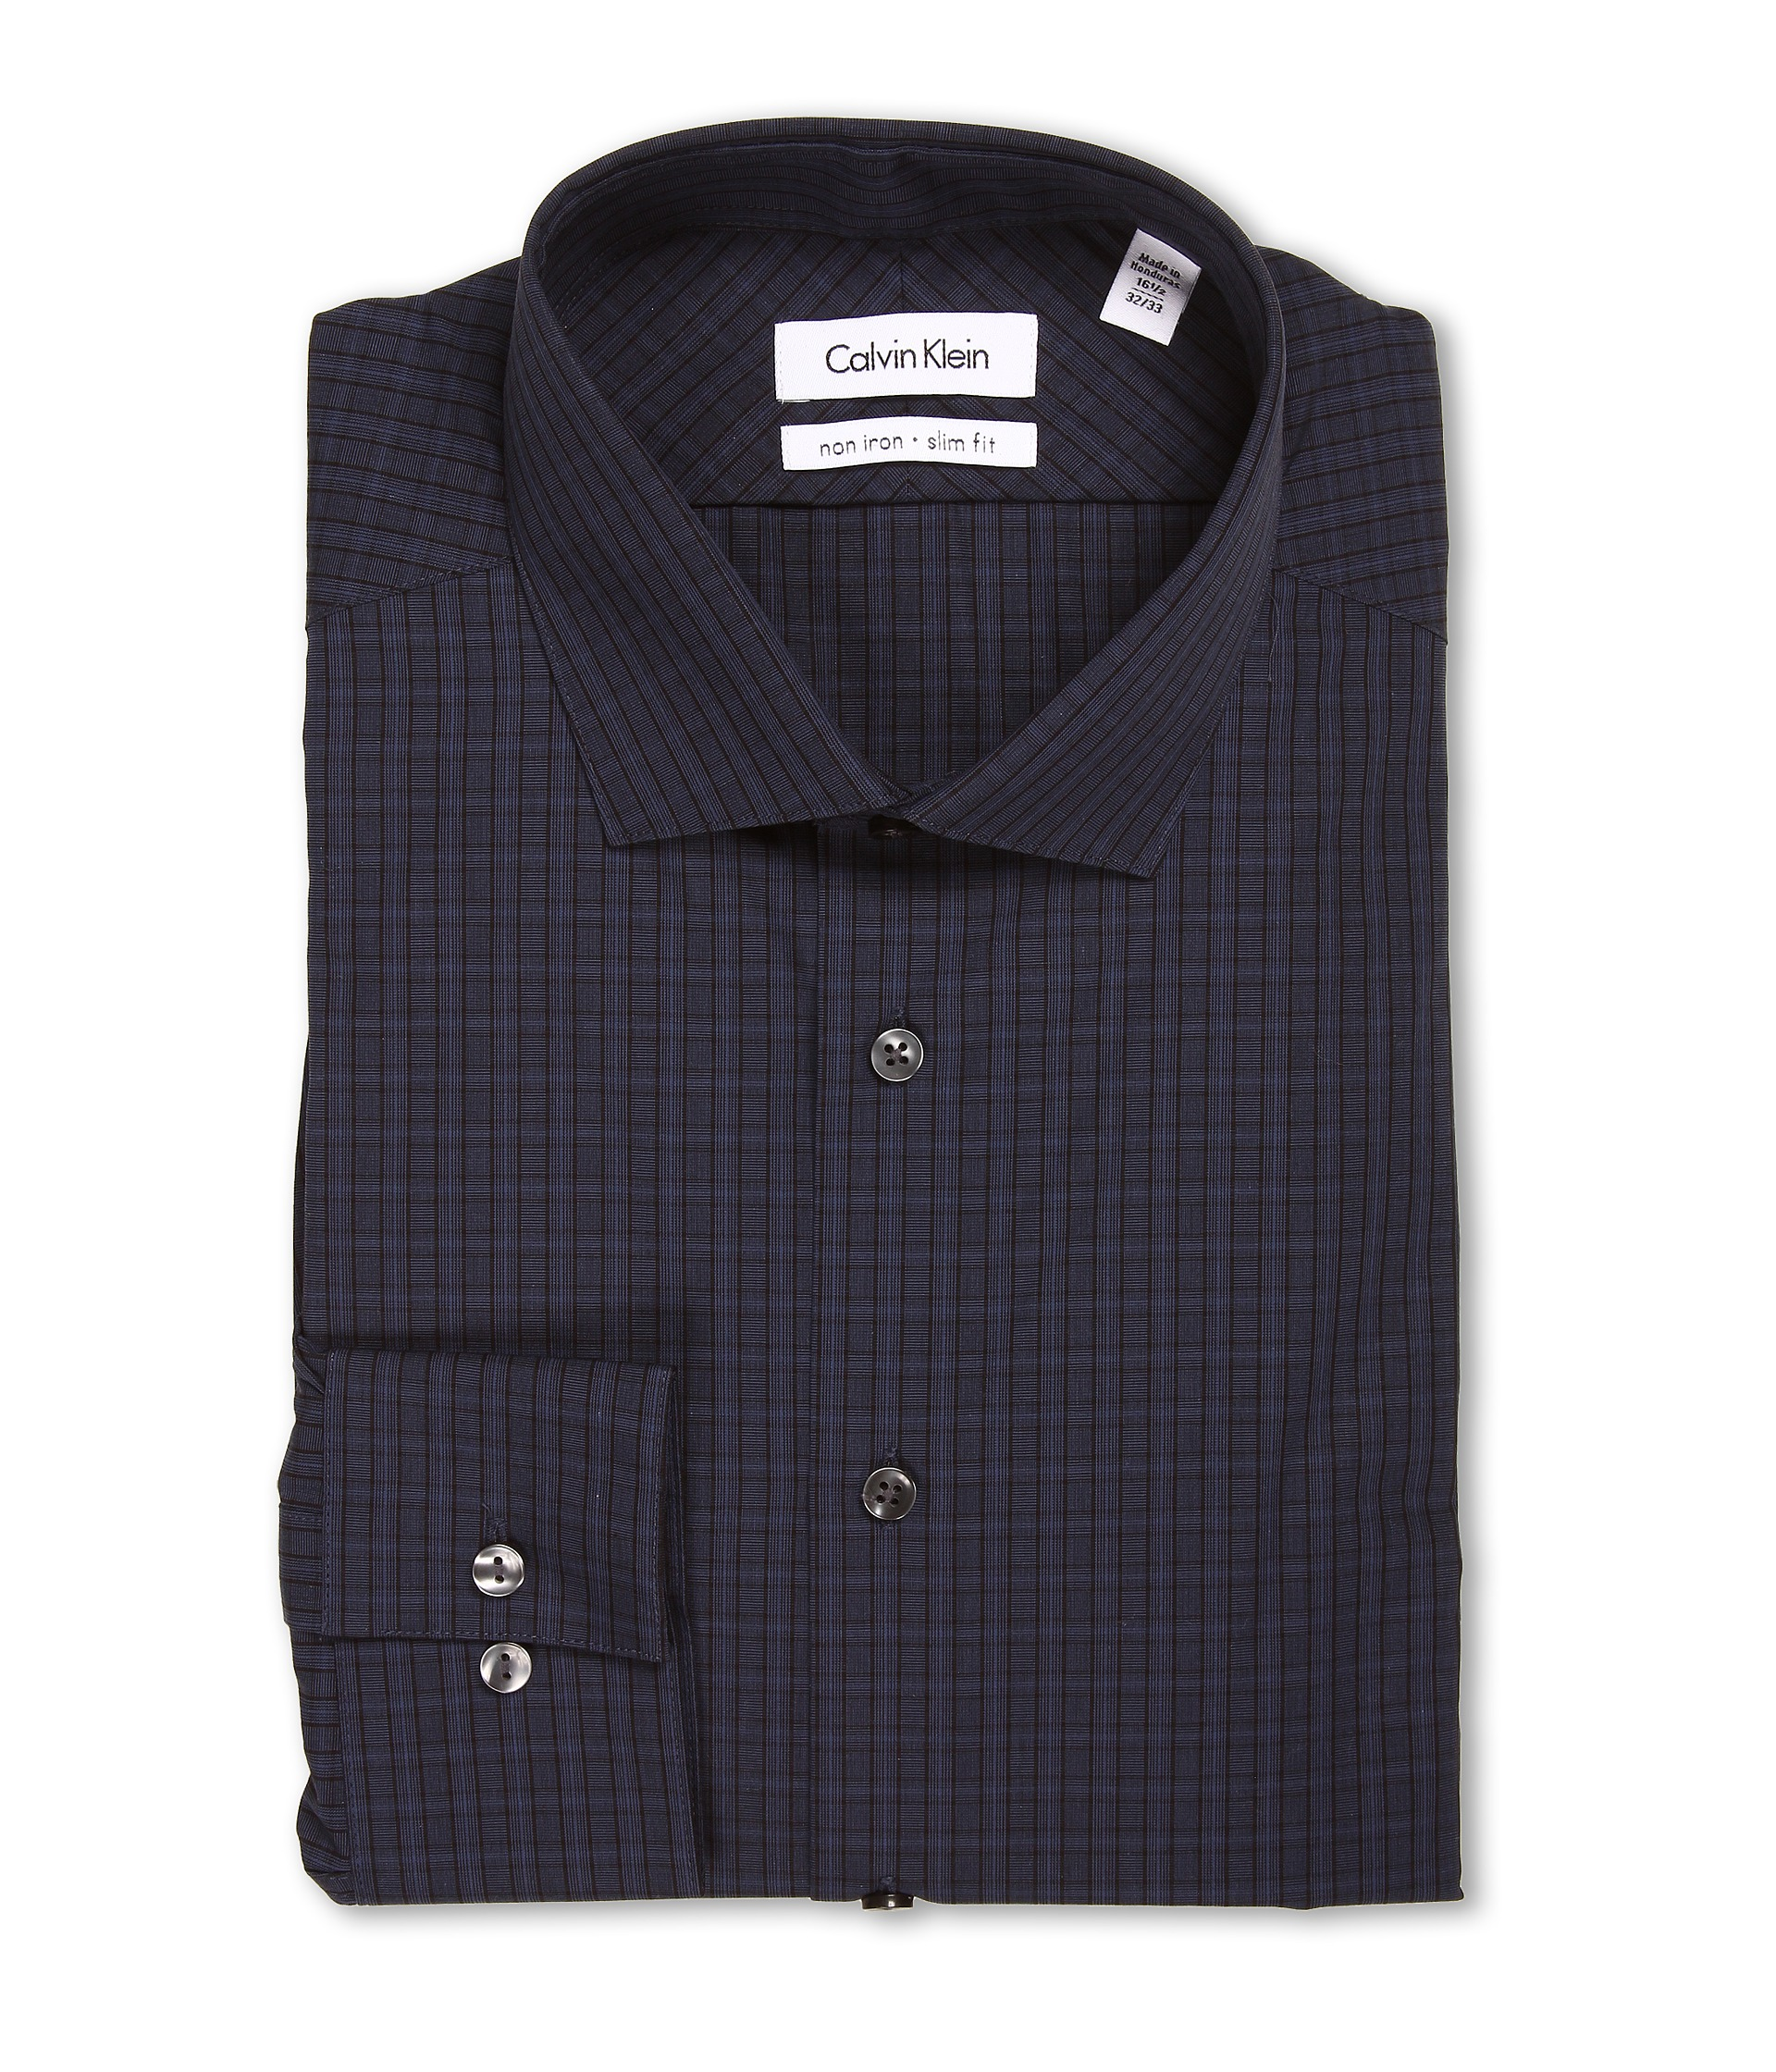 Calvin klein non iron slim fit basketweave plaid dress for Calvin klein x fit dress shirt